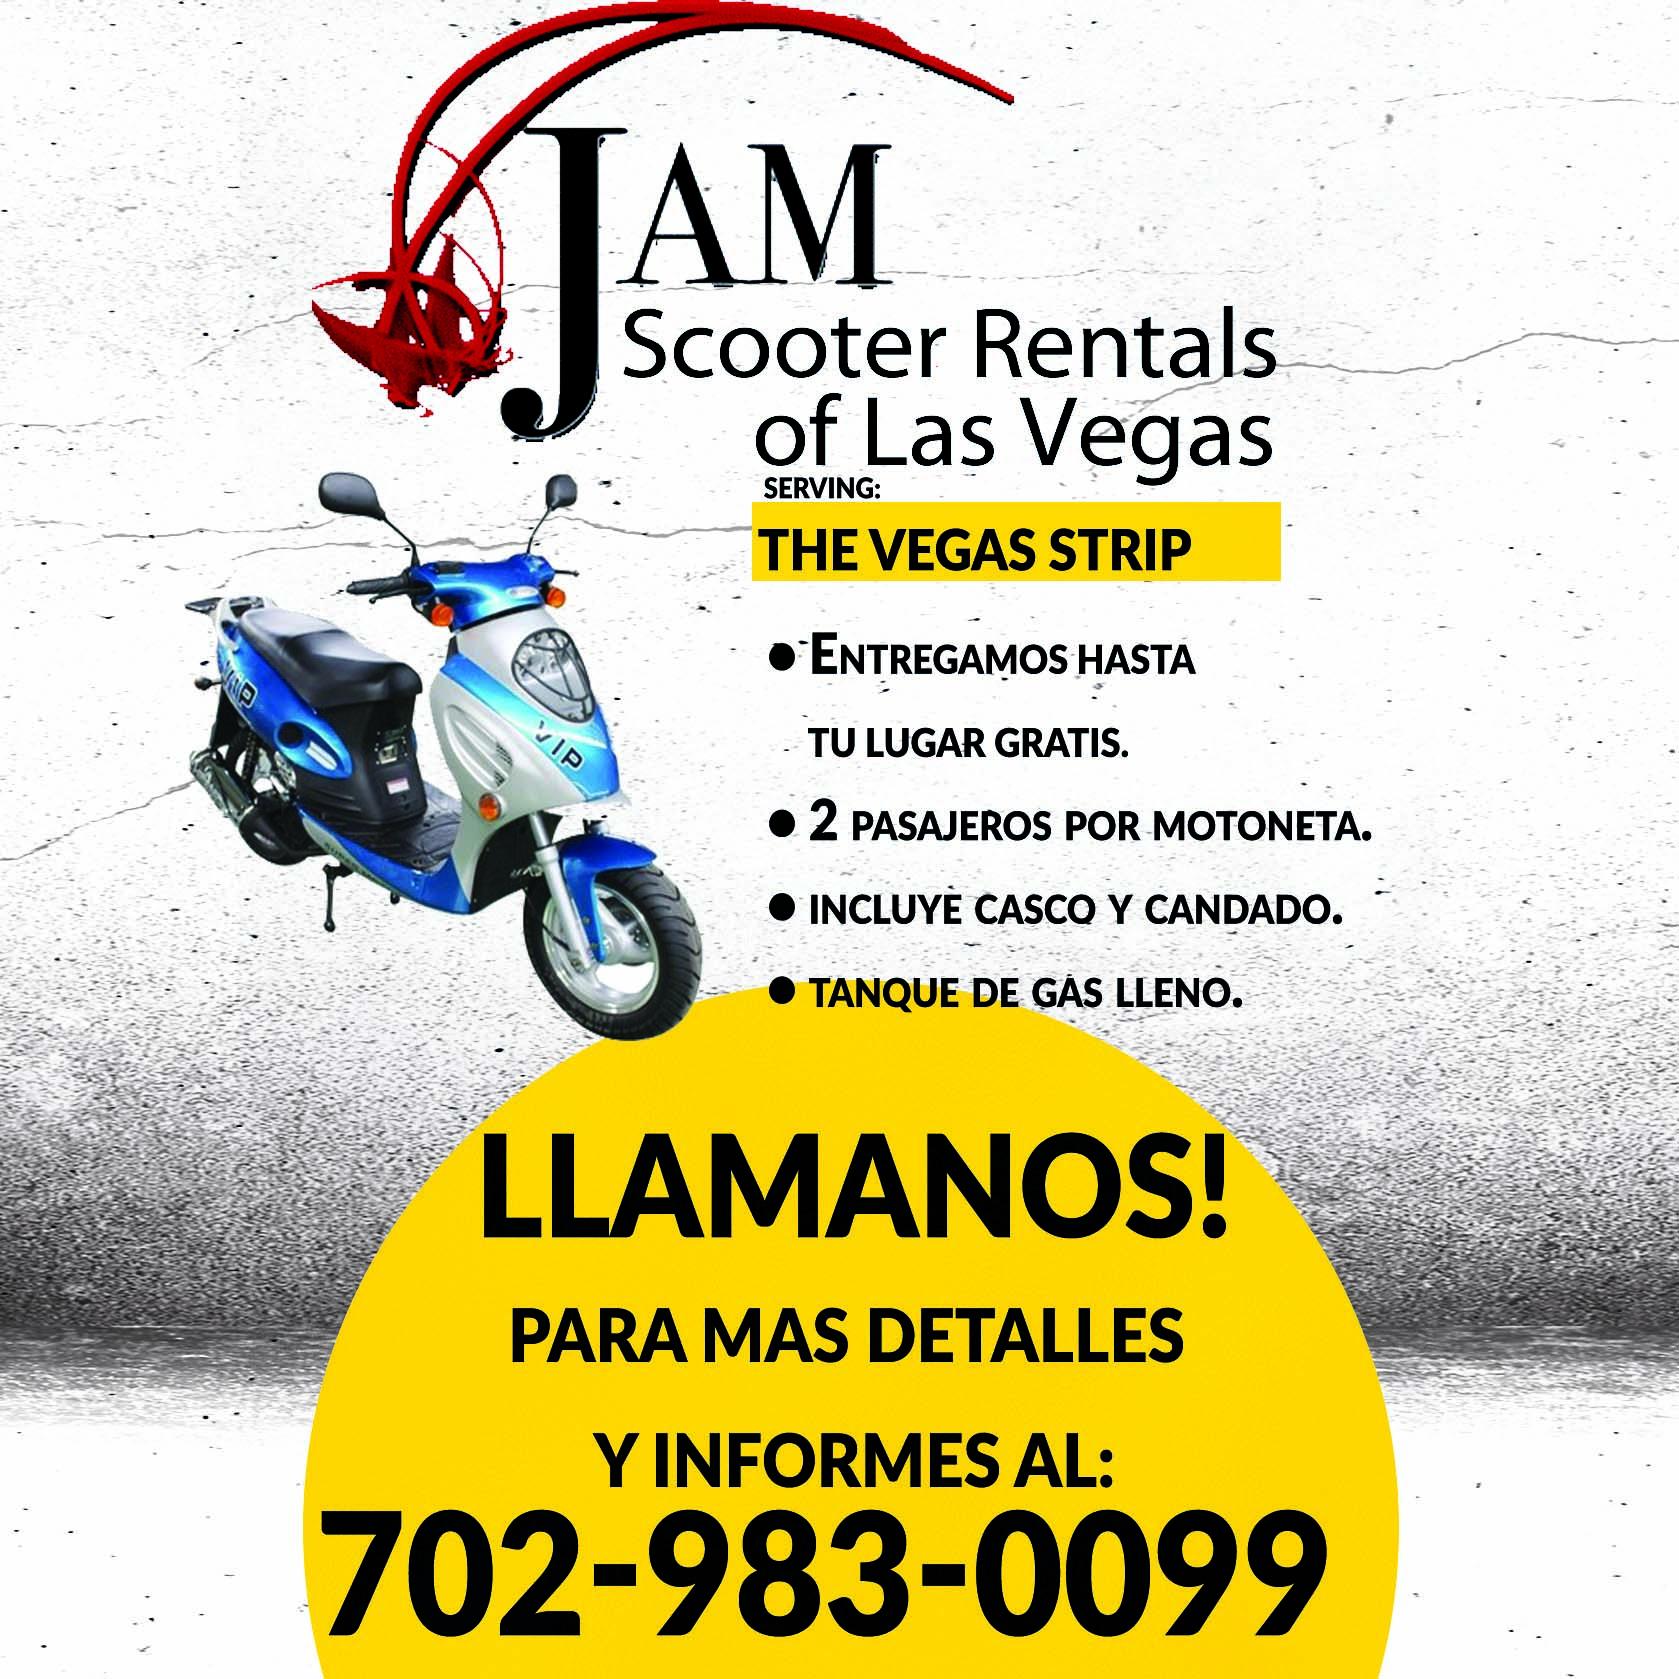 Jam Scooter Rental Of Las Vegas 3105 Westwood Dr Las Vegas Nv